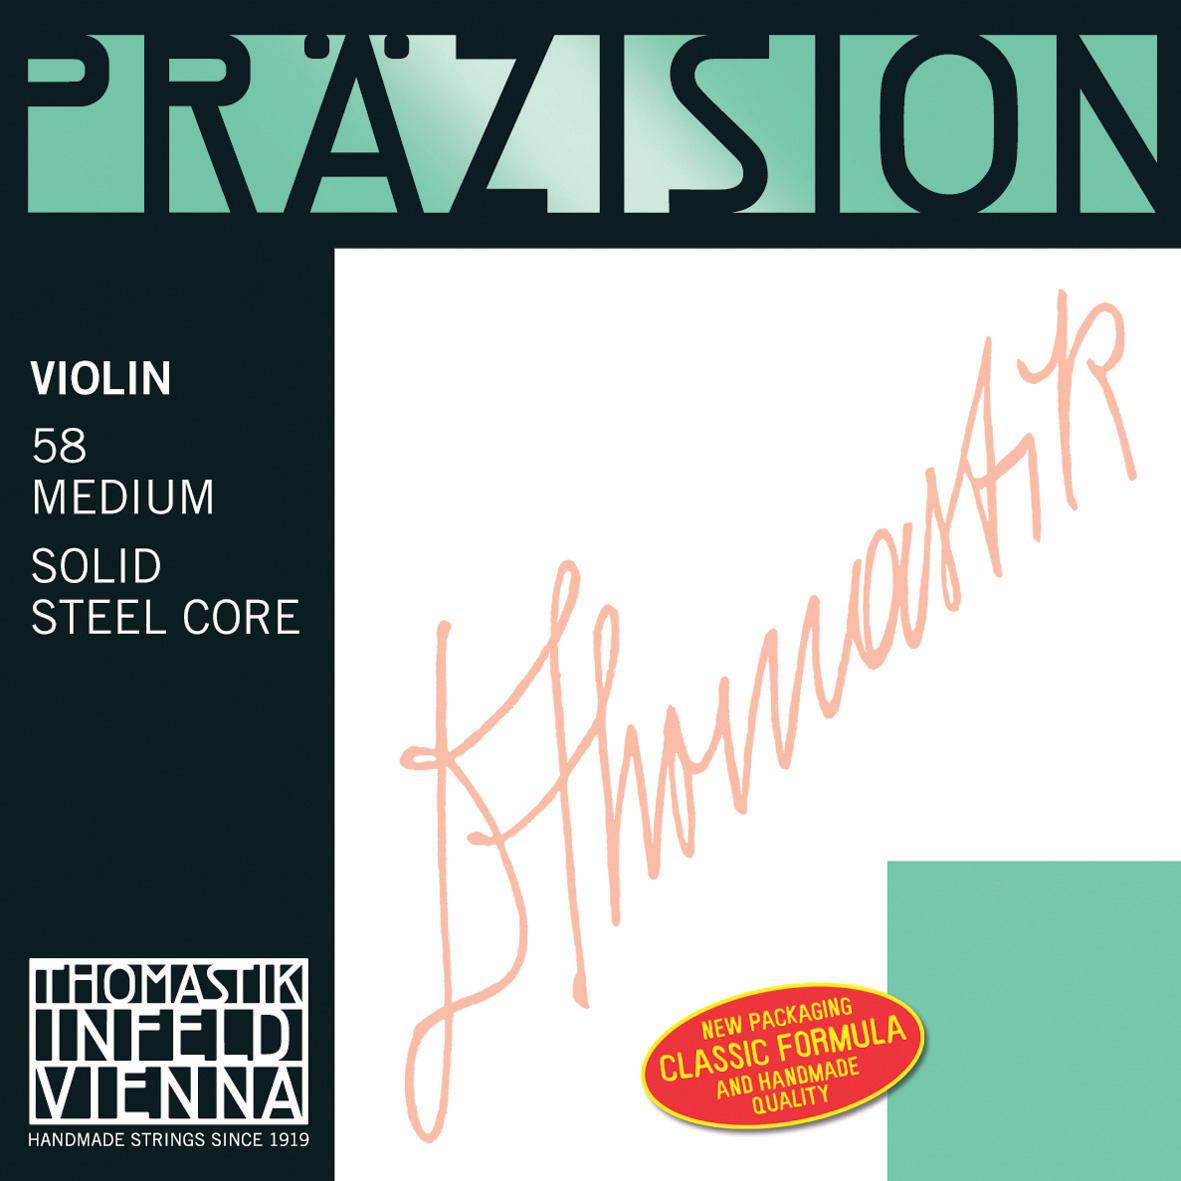 PRÄZISION Thomastik Infeld Strings